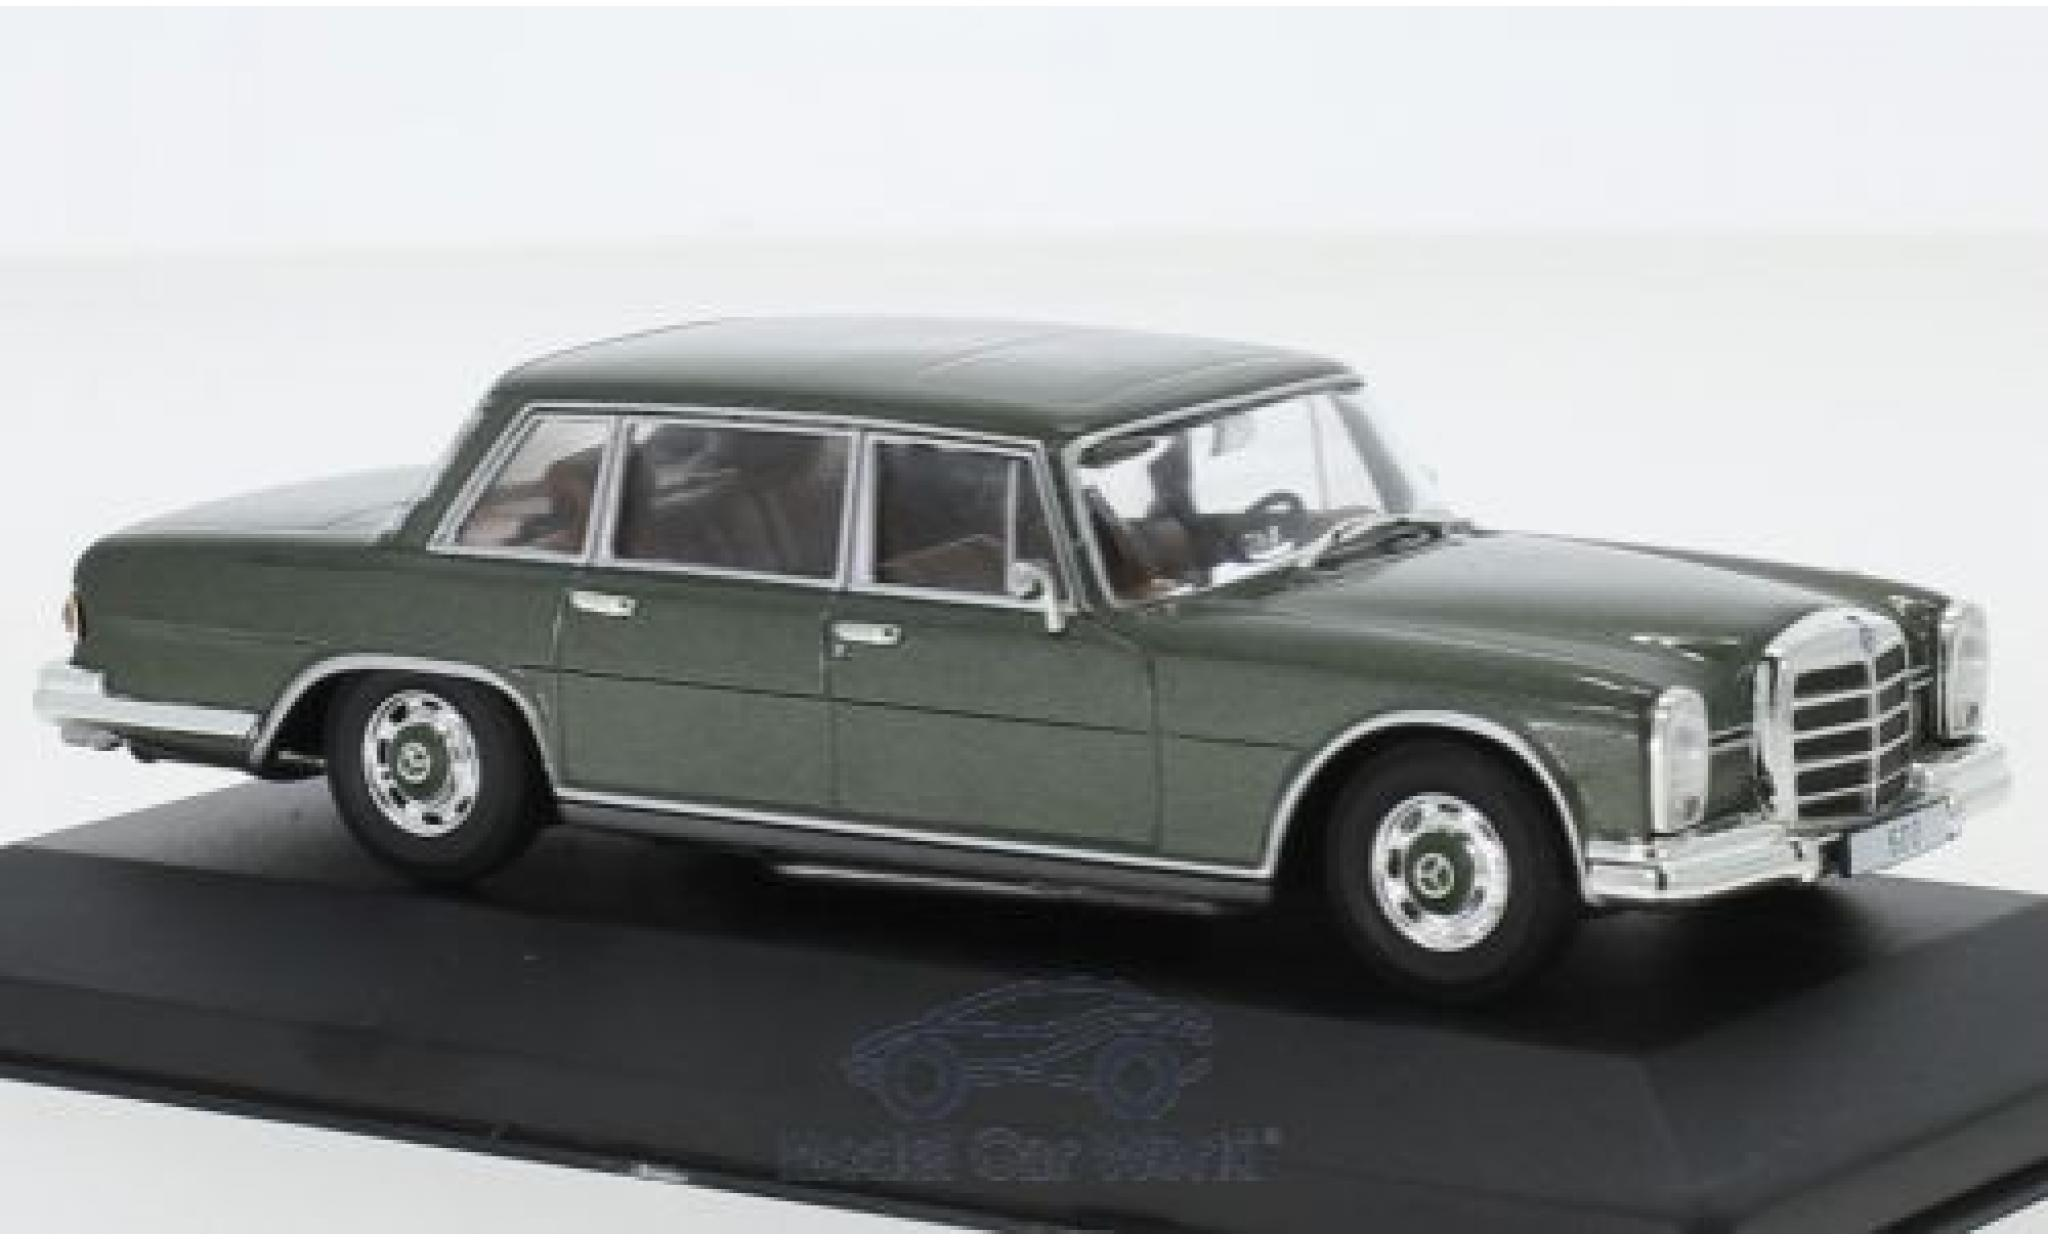 Mercedes 600 1/43 Pct (W100) metallise green 1964